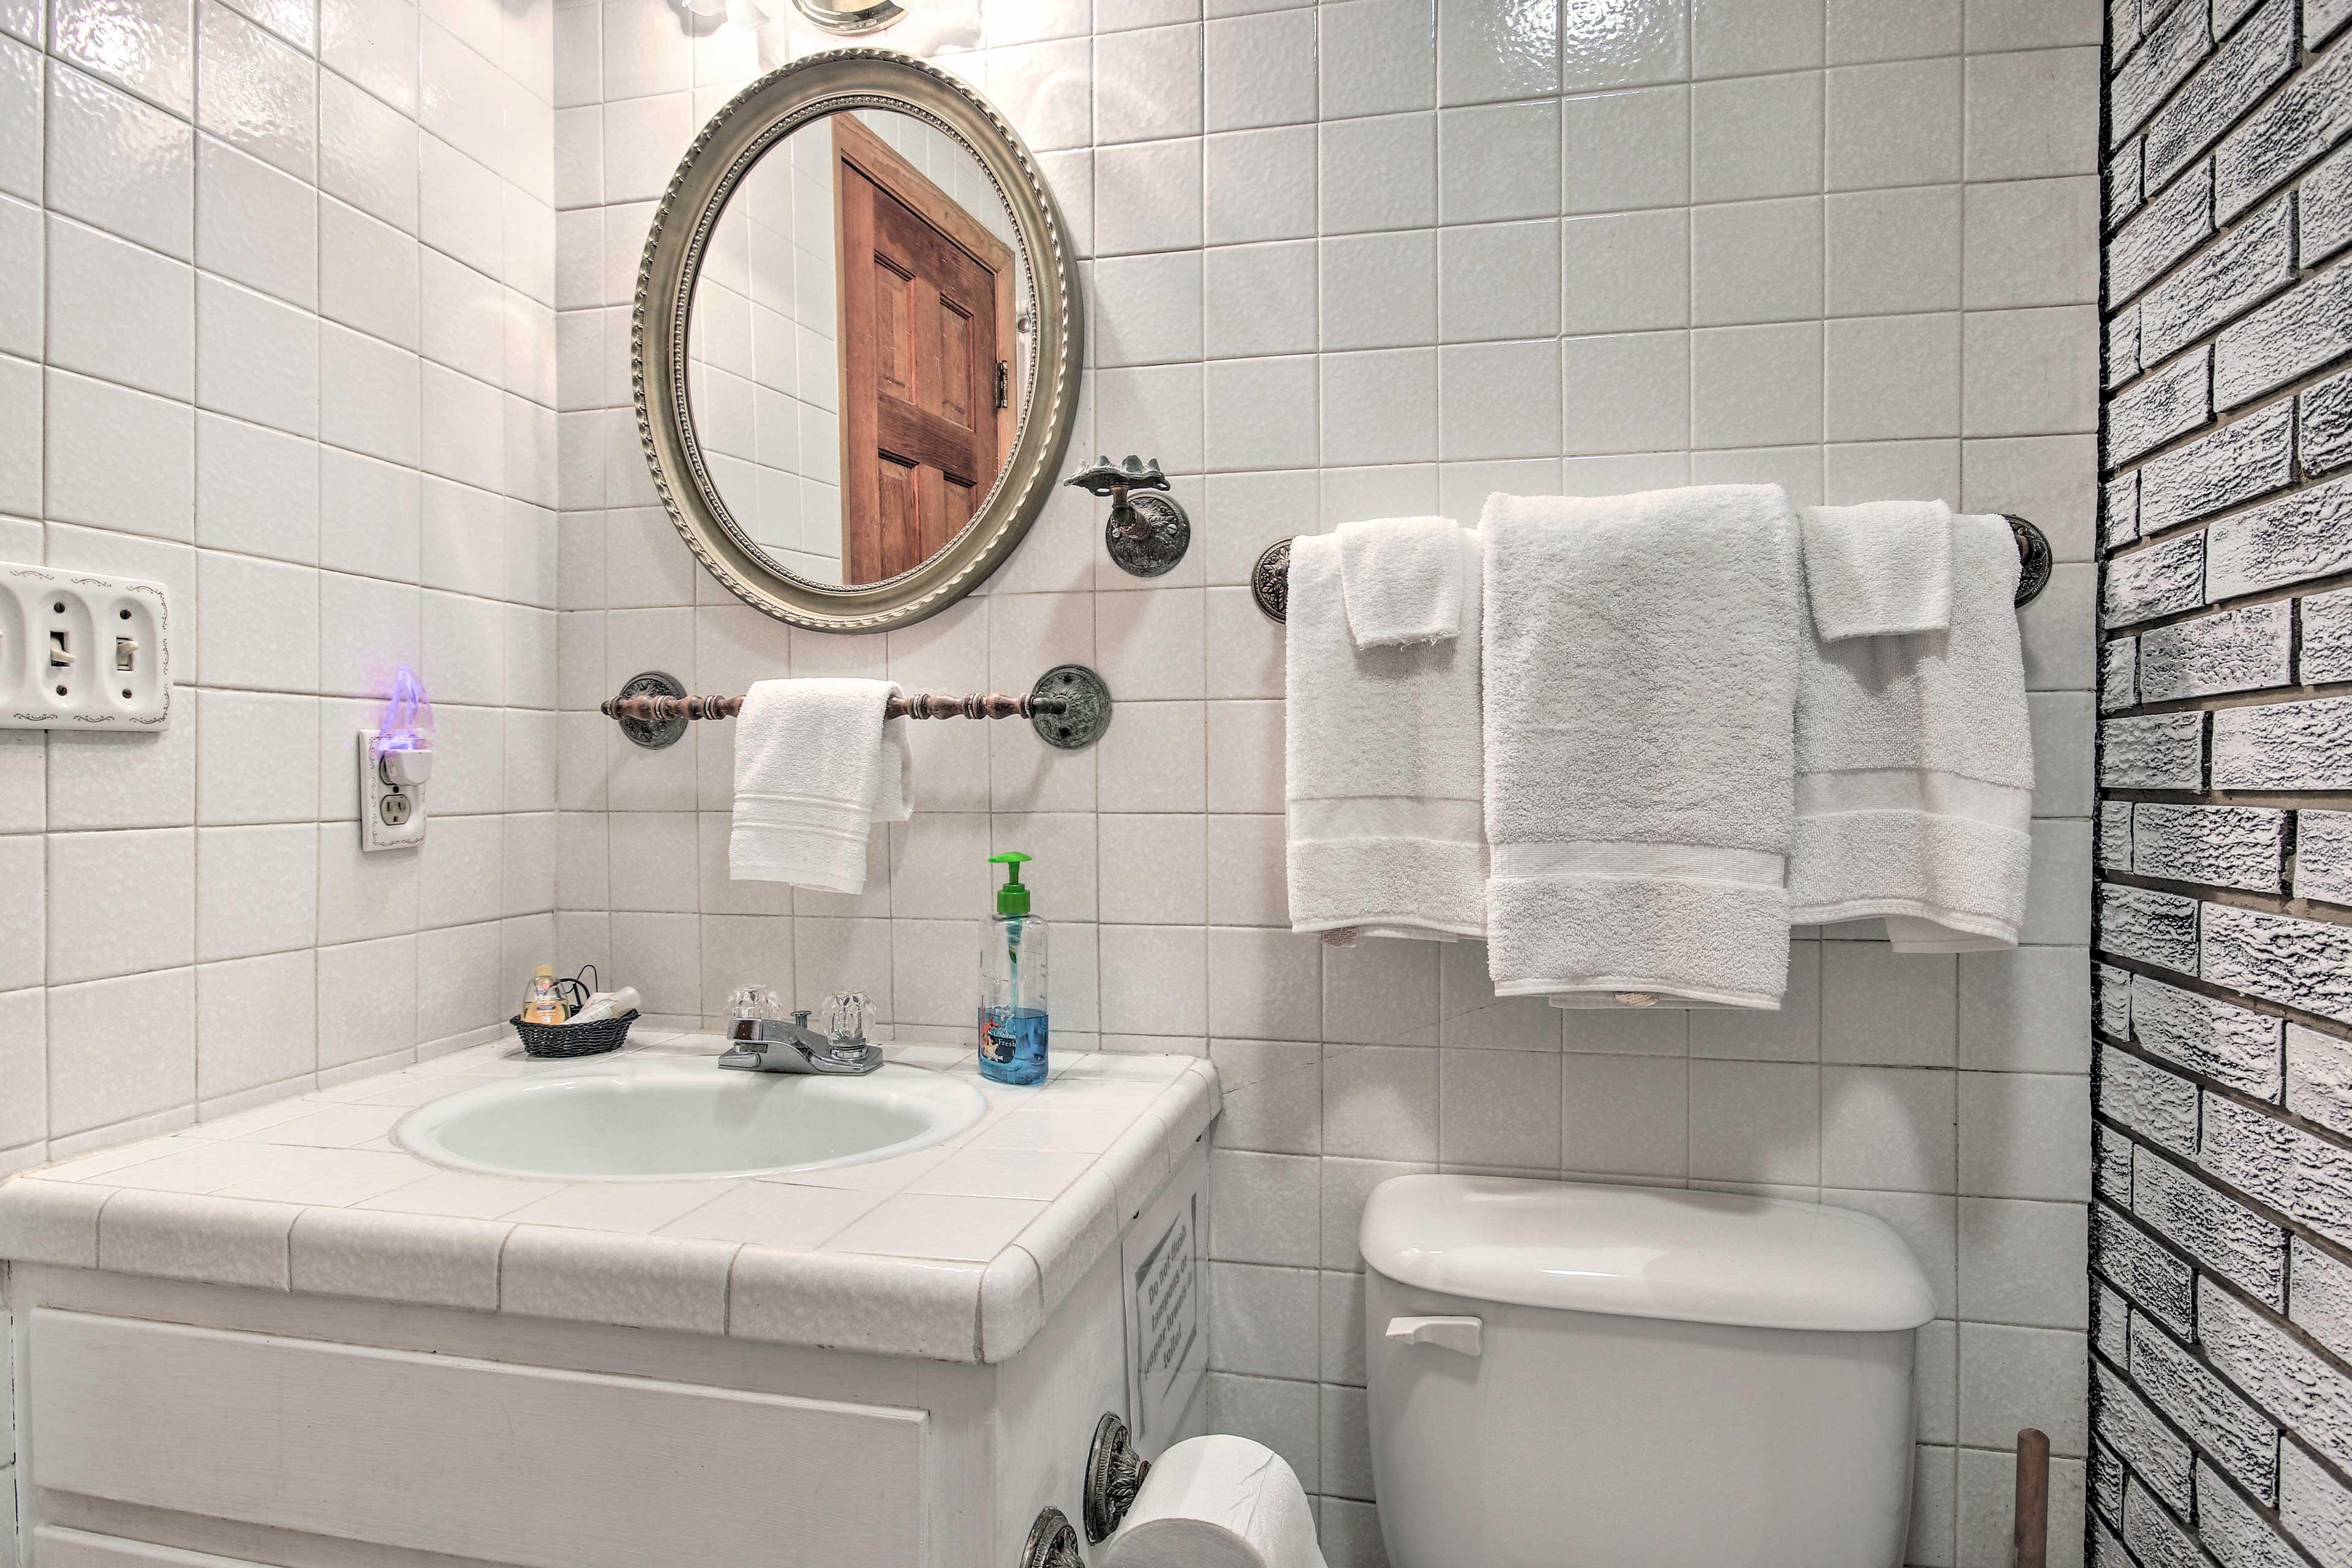 Enjoy the added luxury of another en-suite bathroom.